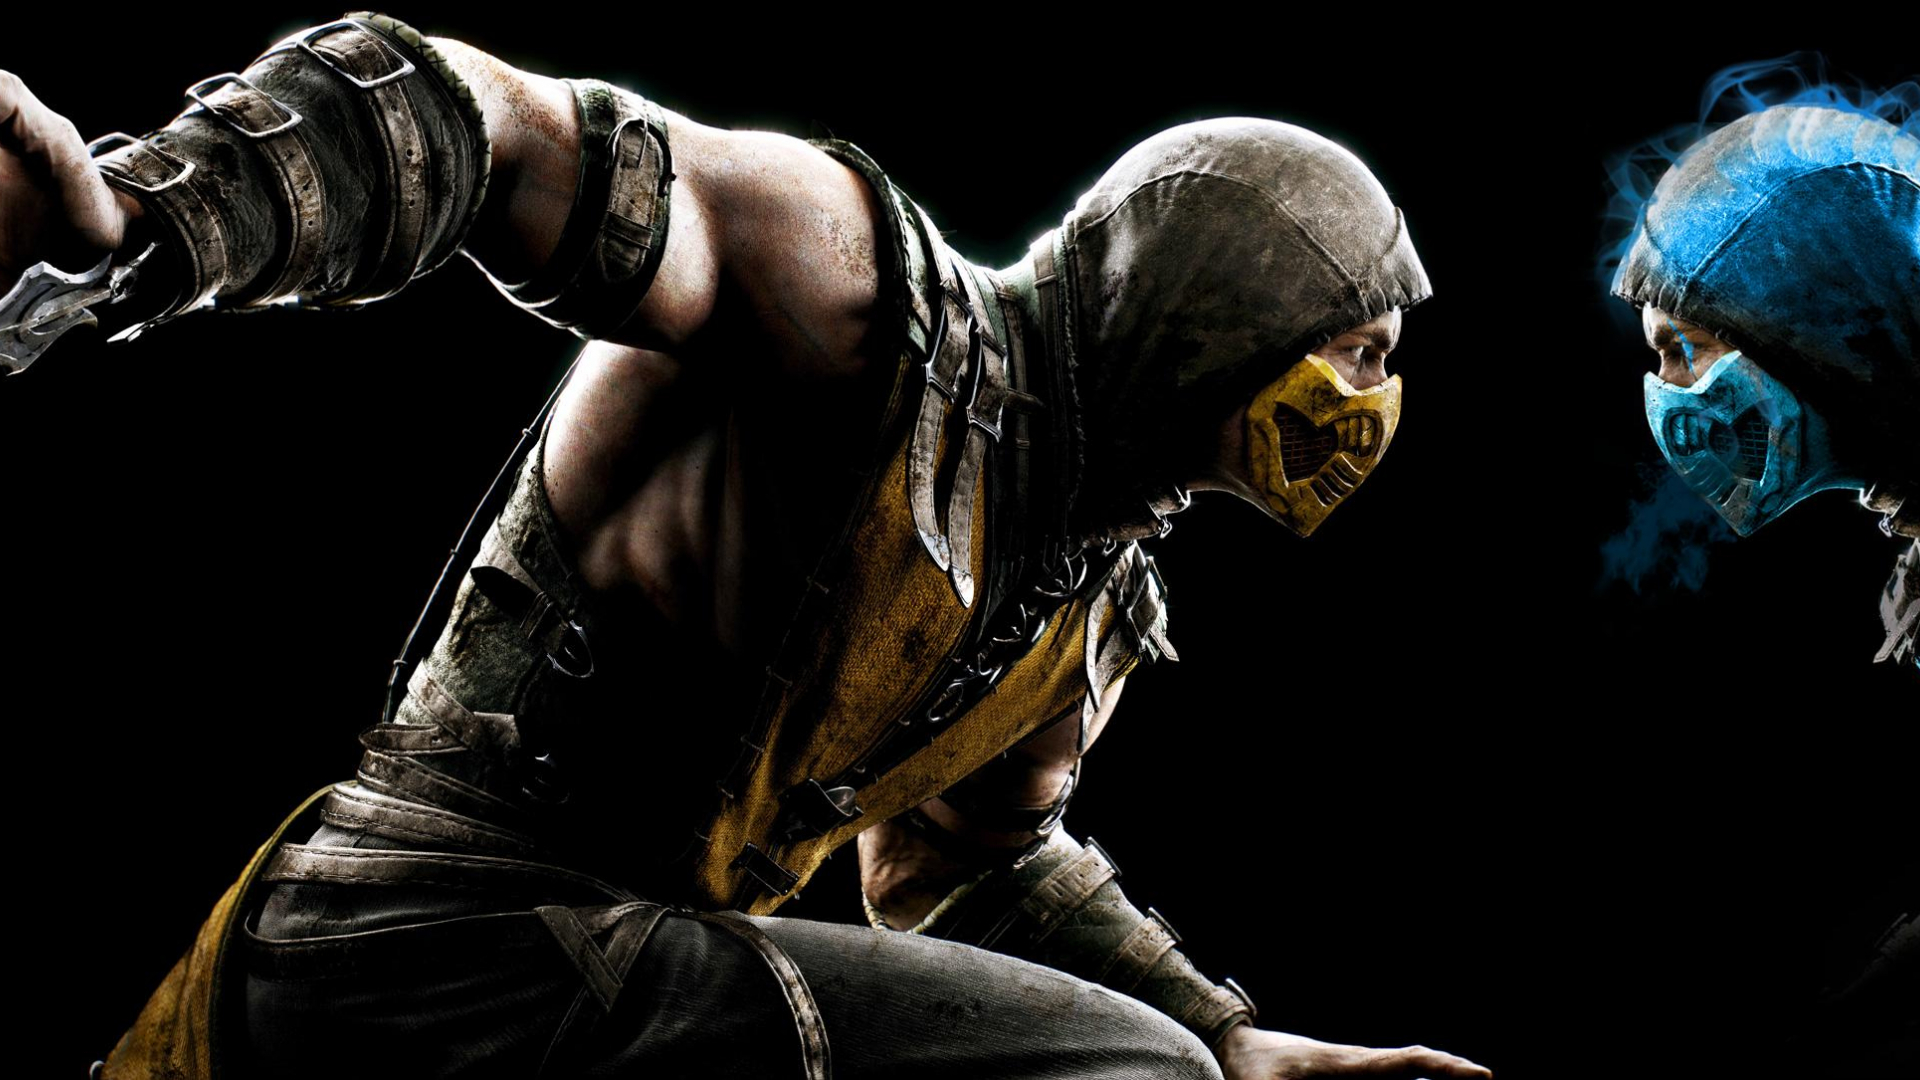 Free Download Mortal Kombat X Scorpion Vs Sub Zero By Mkfan786